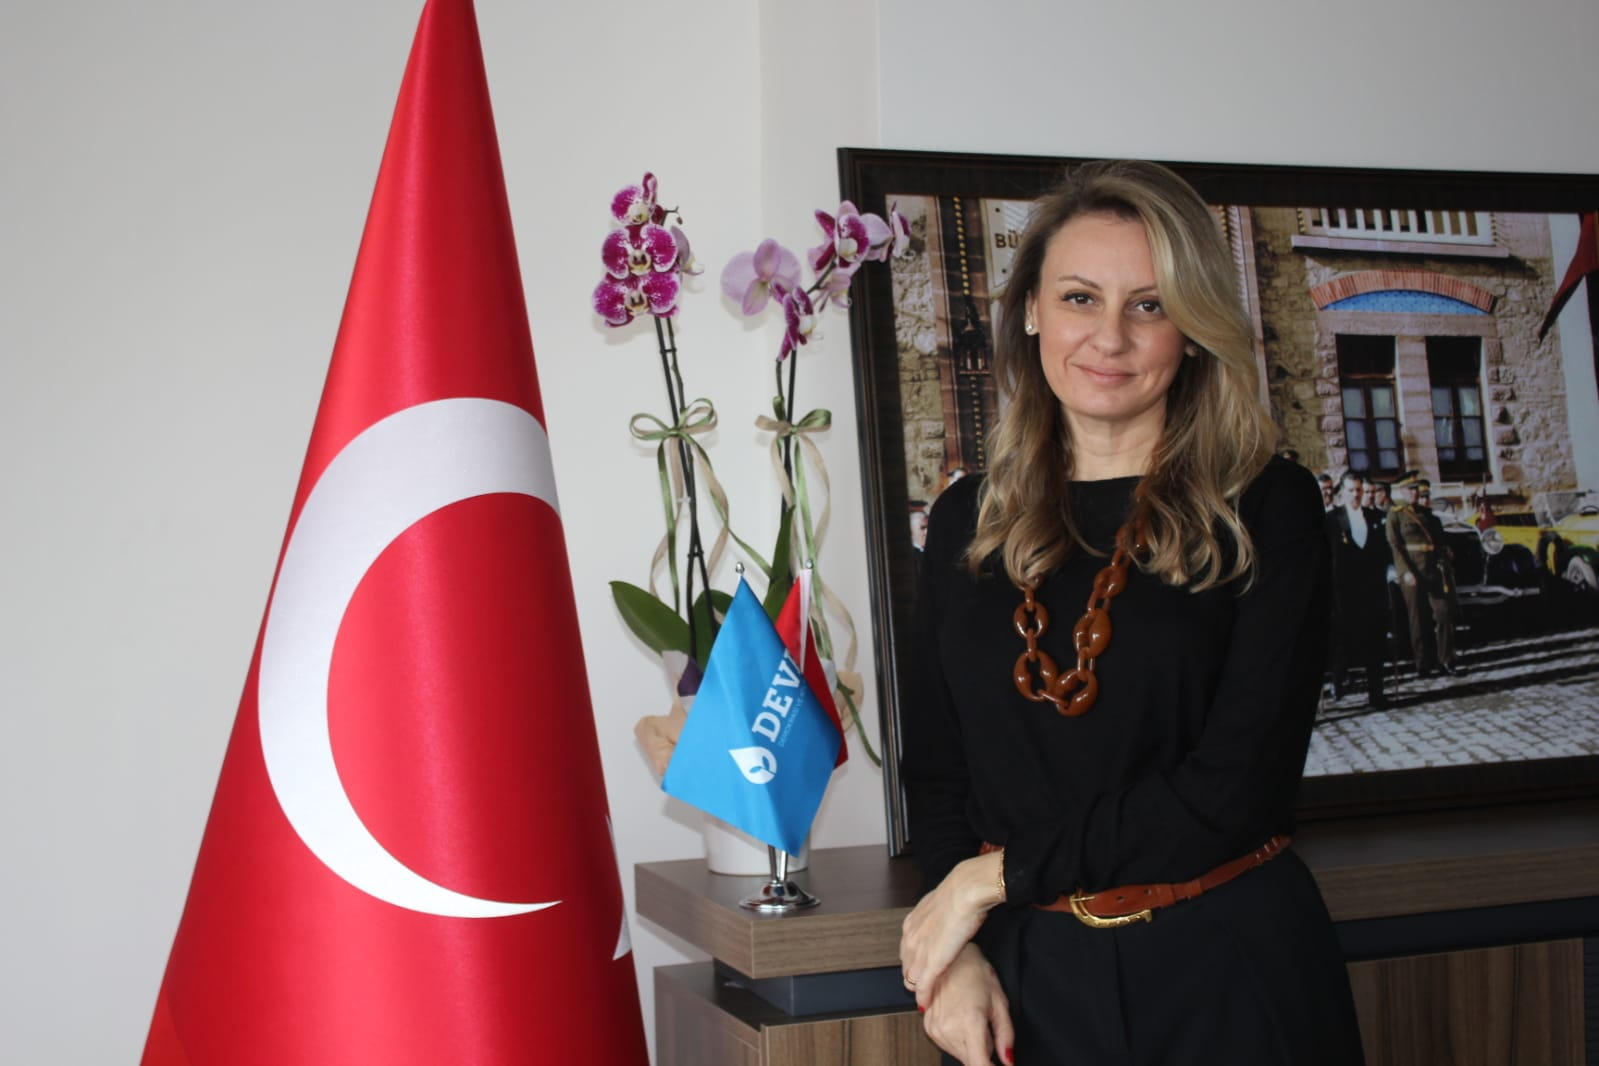 Ösen'den İstanbul Sözleşmesi tepkisi